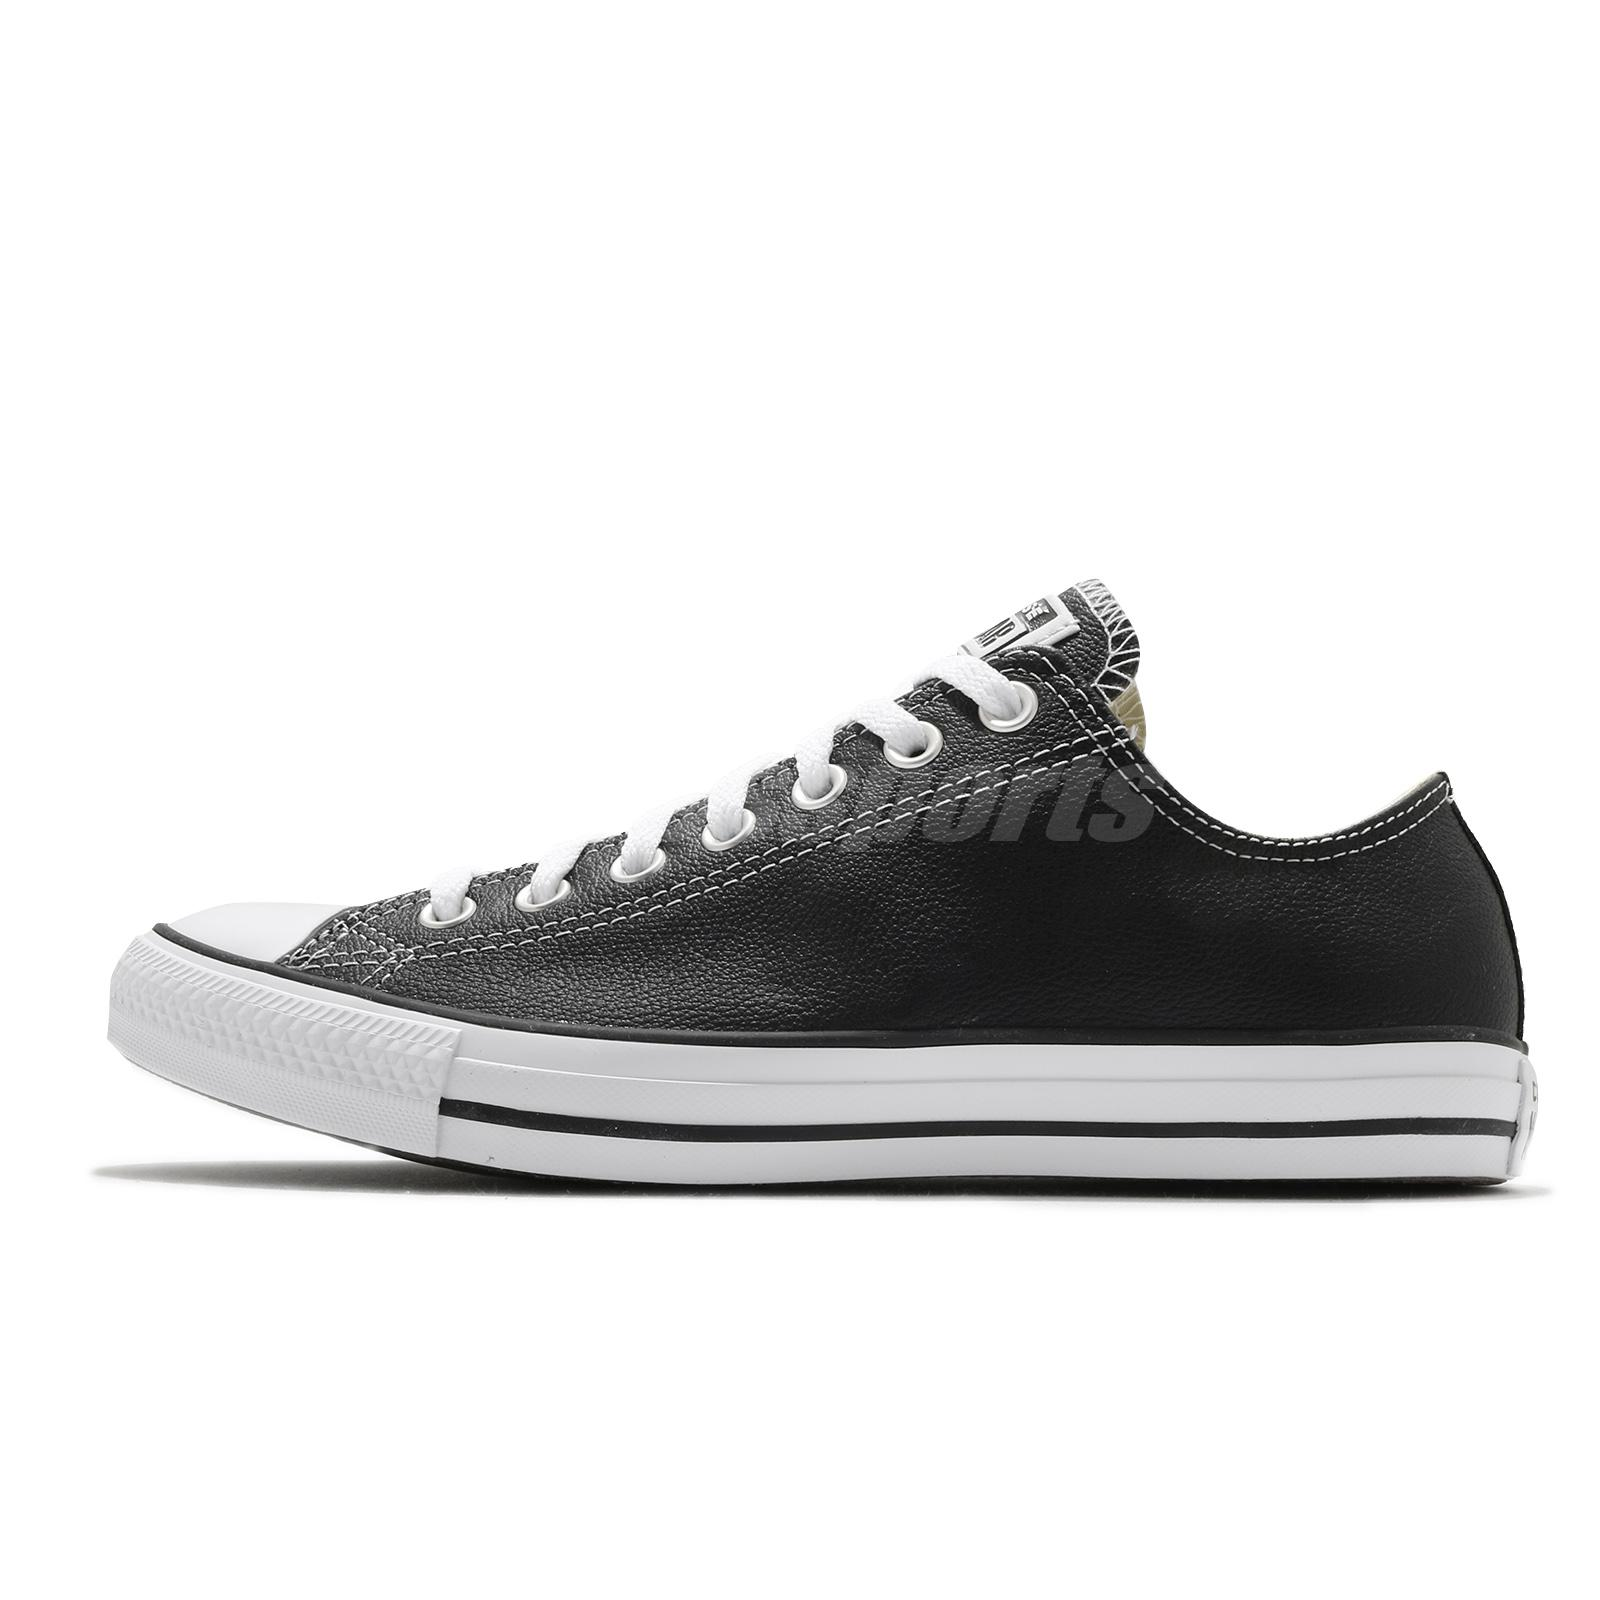 b502b589a8a2 Converse Chuck Taylor All Star OX Oxford Leather Black Men Women Shoes  132174C